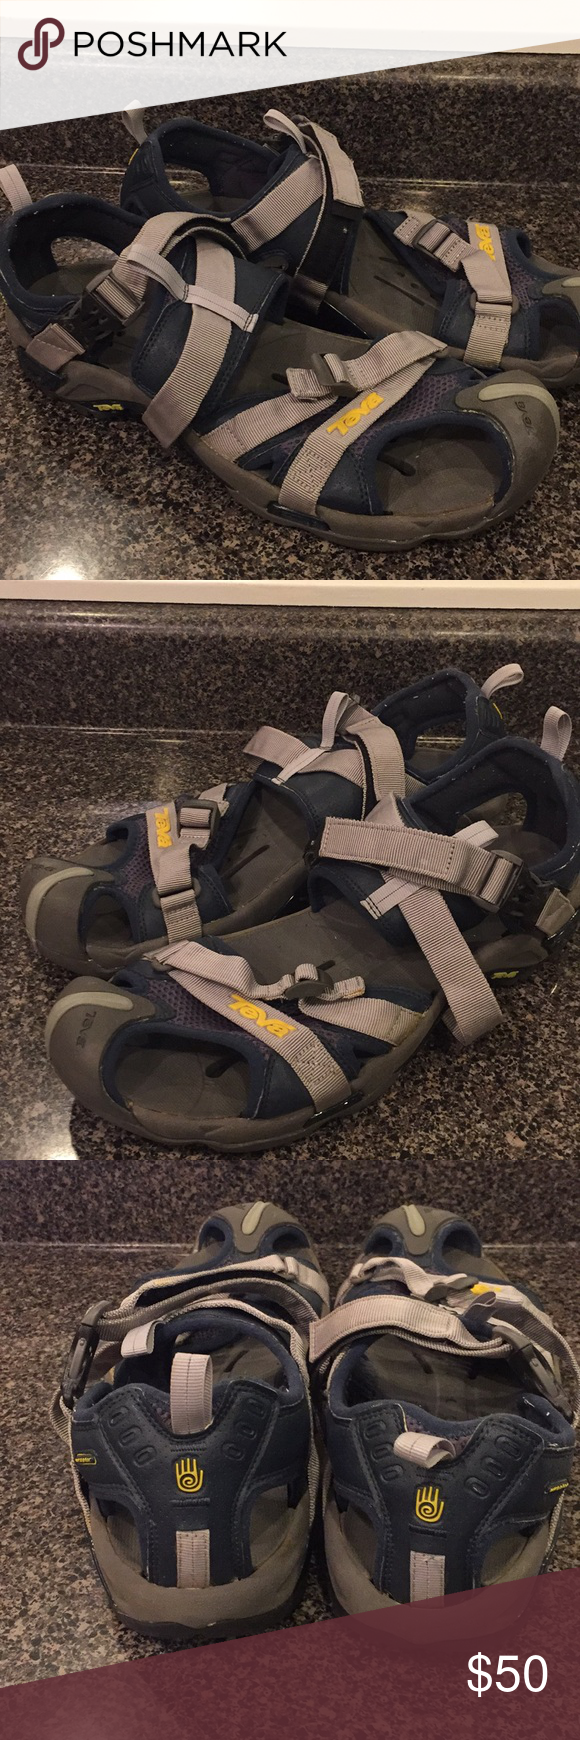 732306105 Size 14 Teva Karnali Wraptor Close Toe Adj. Sandal Used Size 14 Teva  Karnali Wraptor Closed Toe Adjustable Sandal Slight Yellowing on straps.